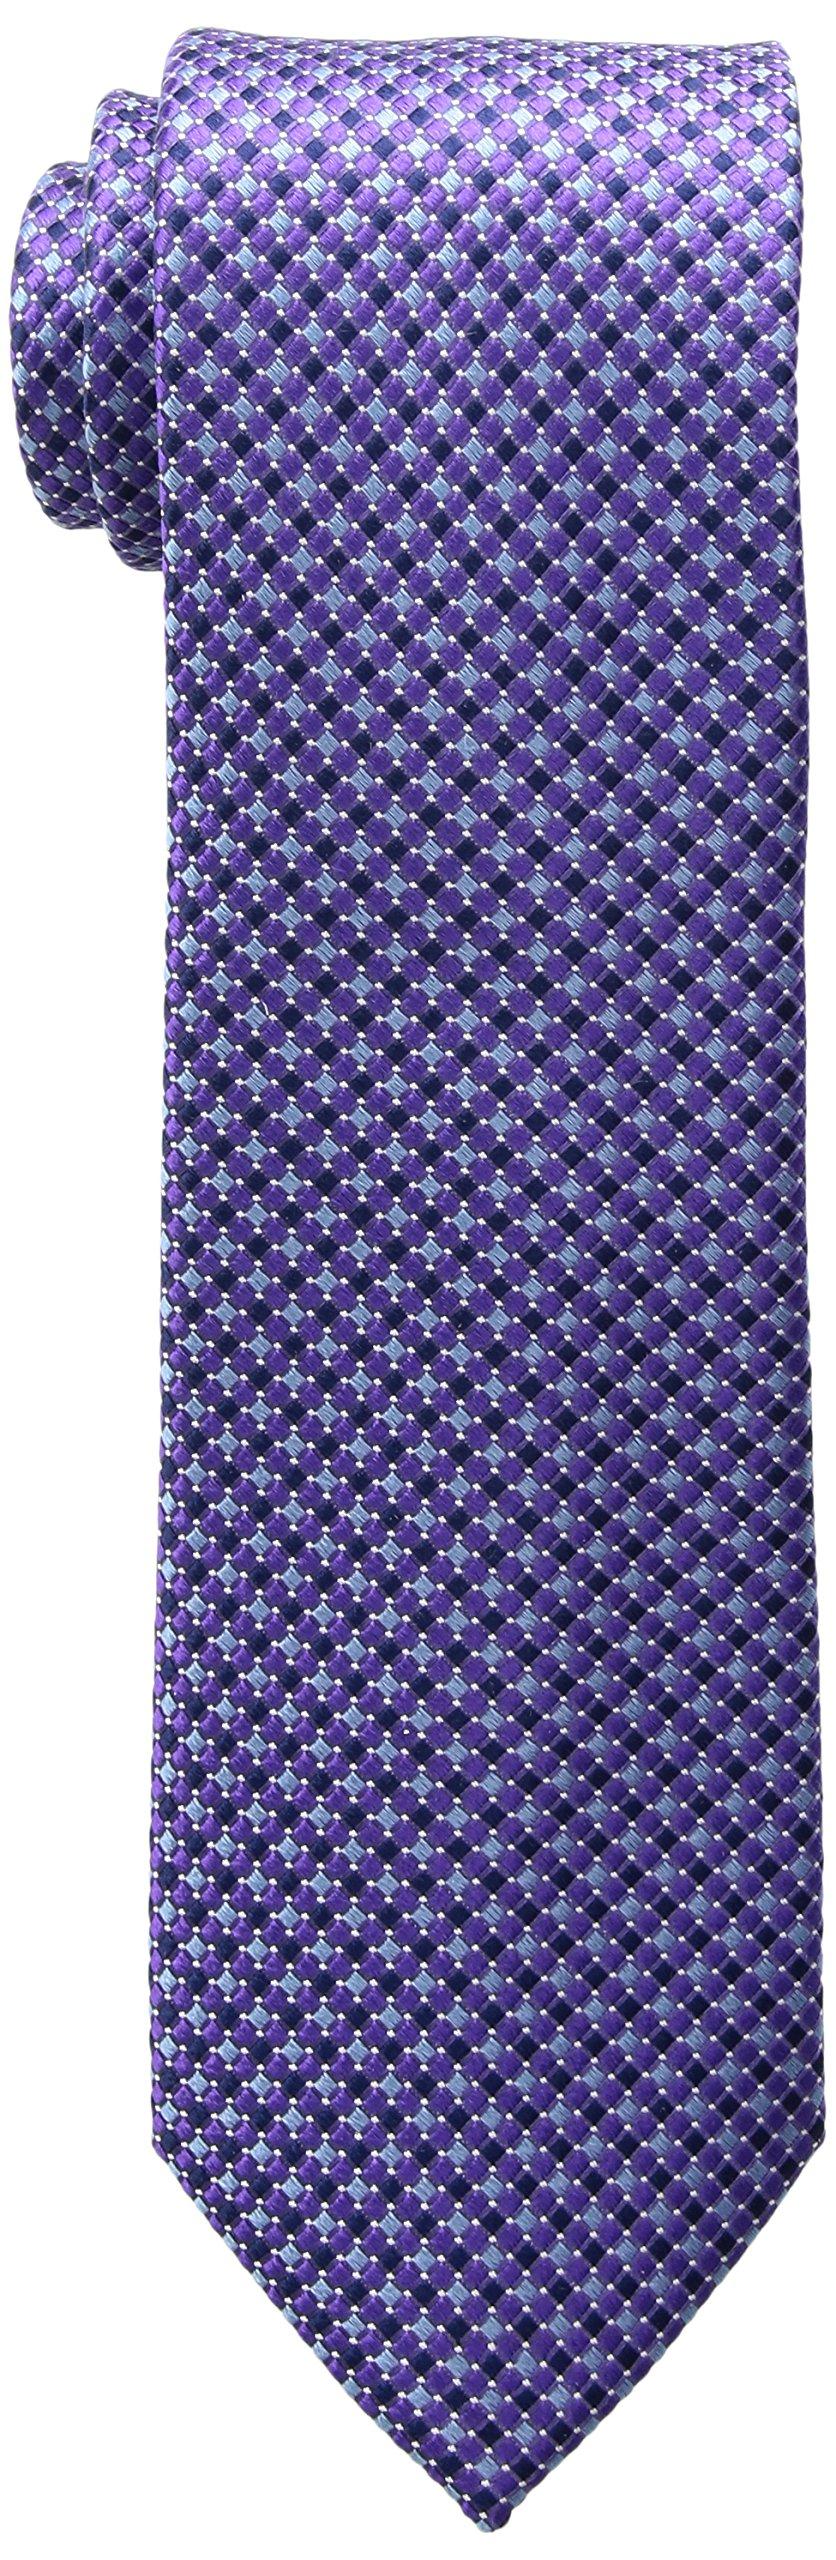 Tommy Hilfiger Men's Core Micro Tie, Purple, One Size